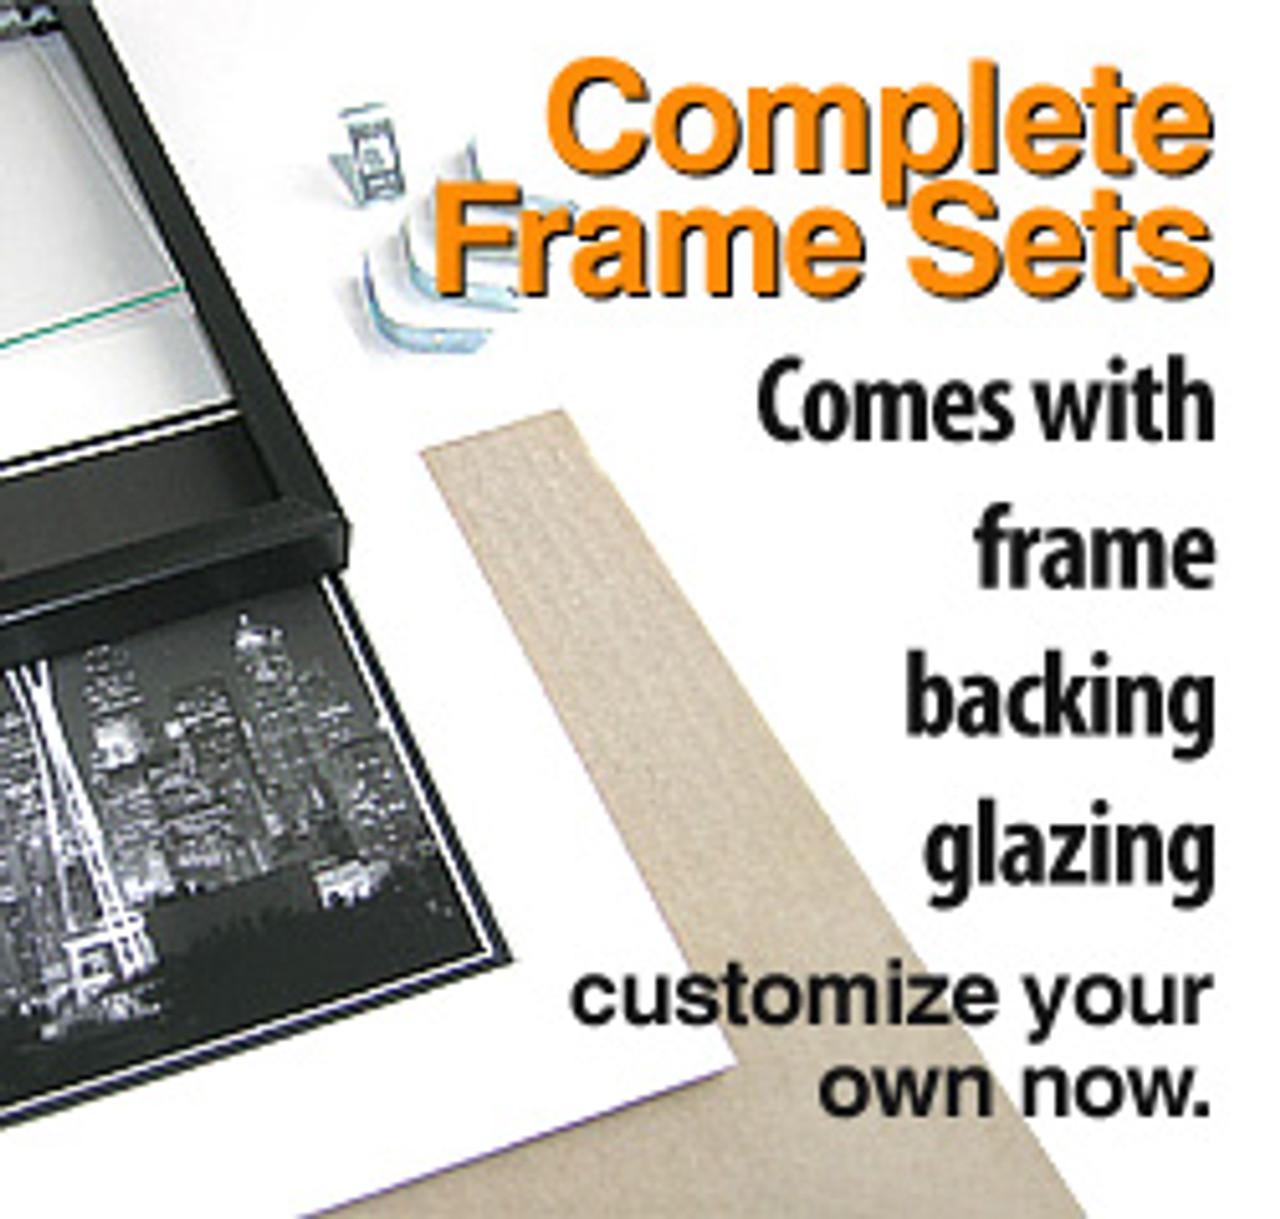 16 x 20 Frame Set